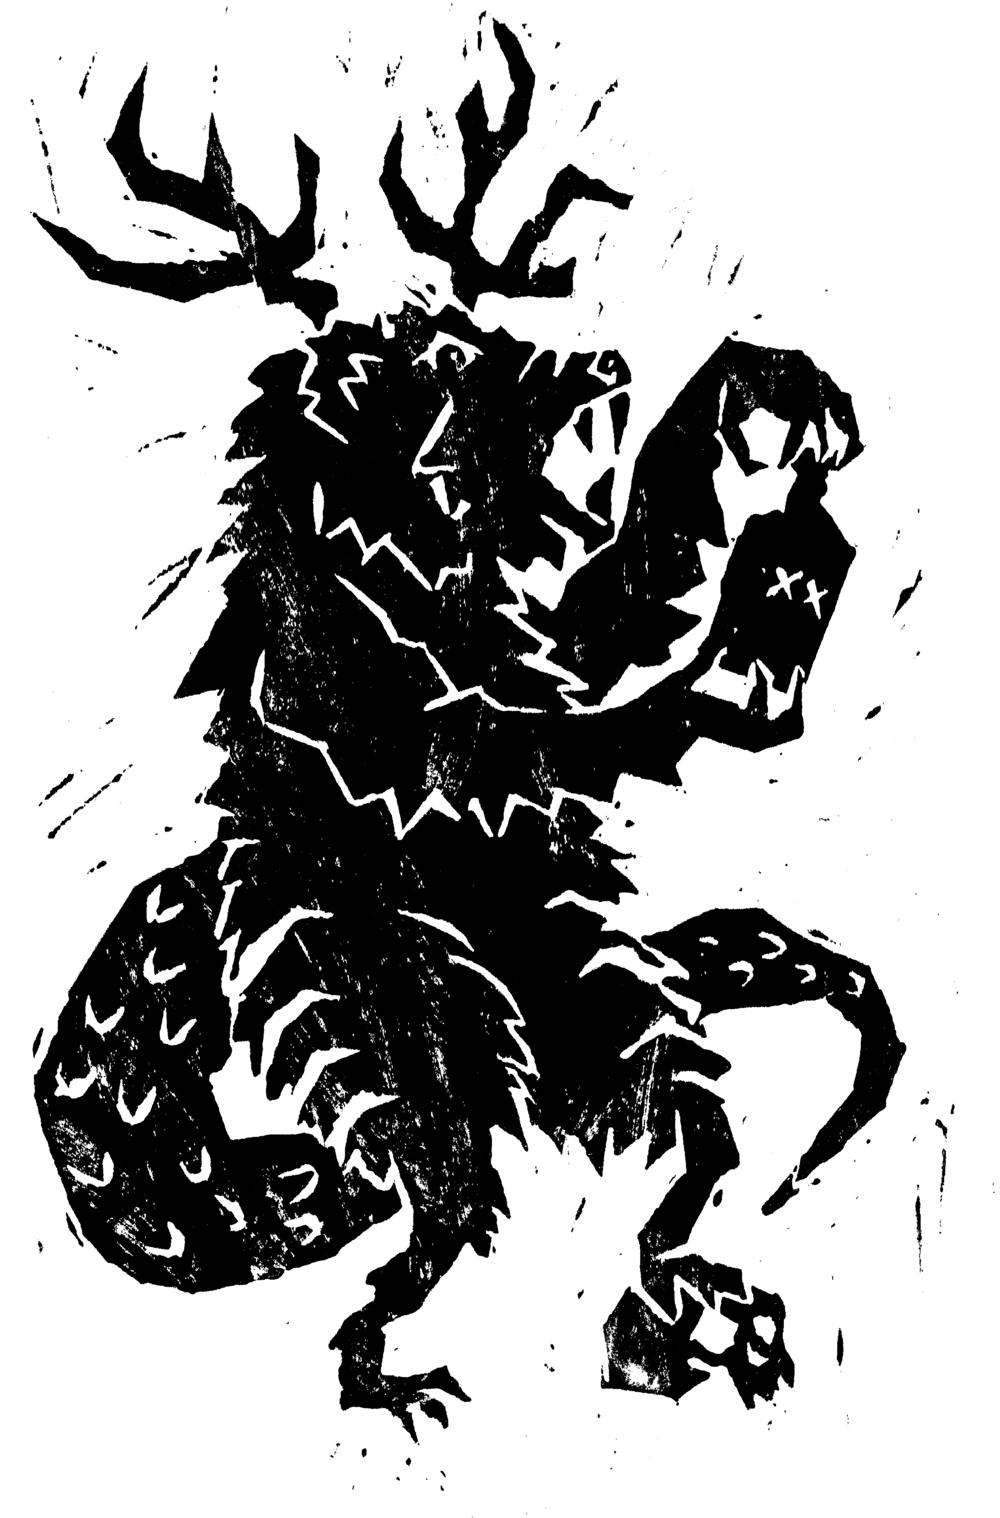 Lino cut illustration of a hybrid creature